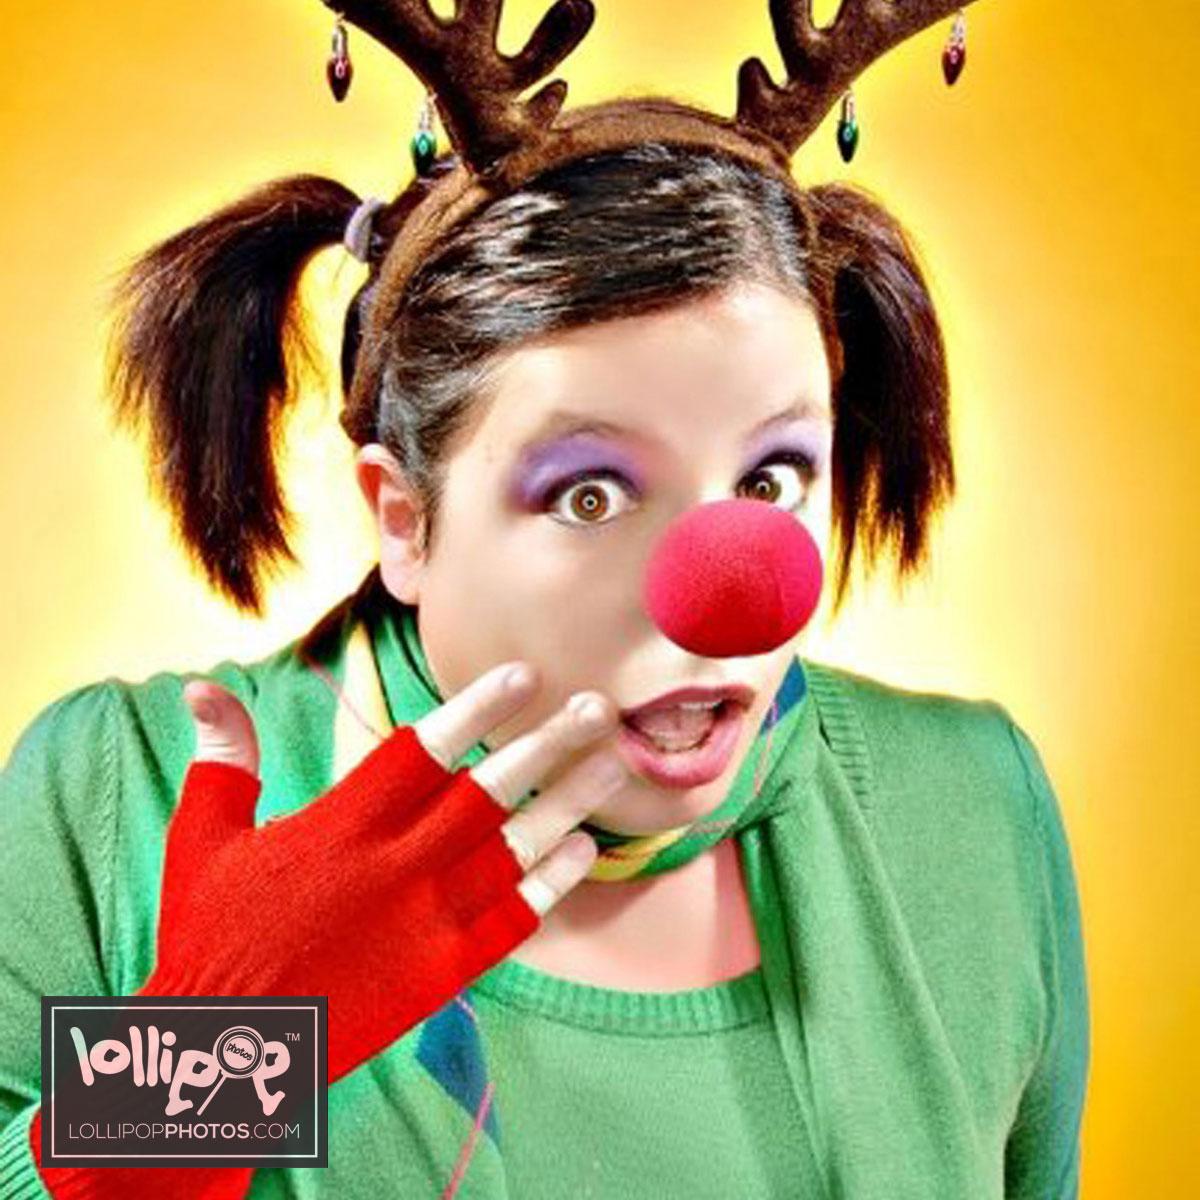 msdig-nora-canfield-lollipop-photos-173.jpg